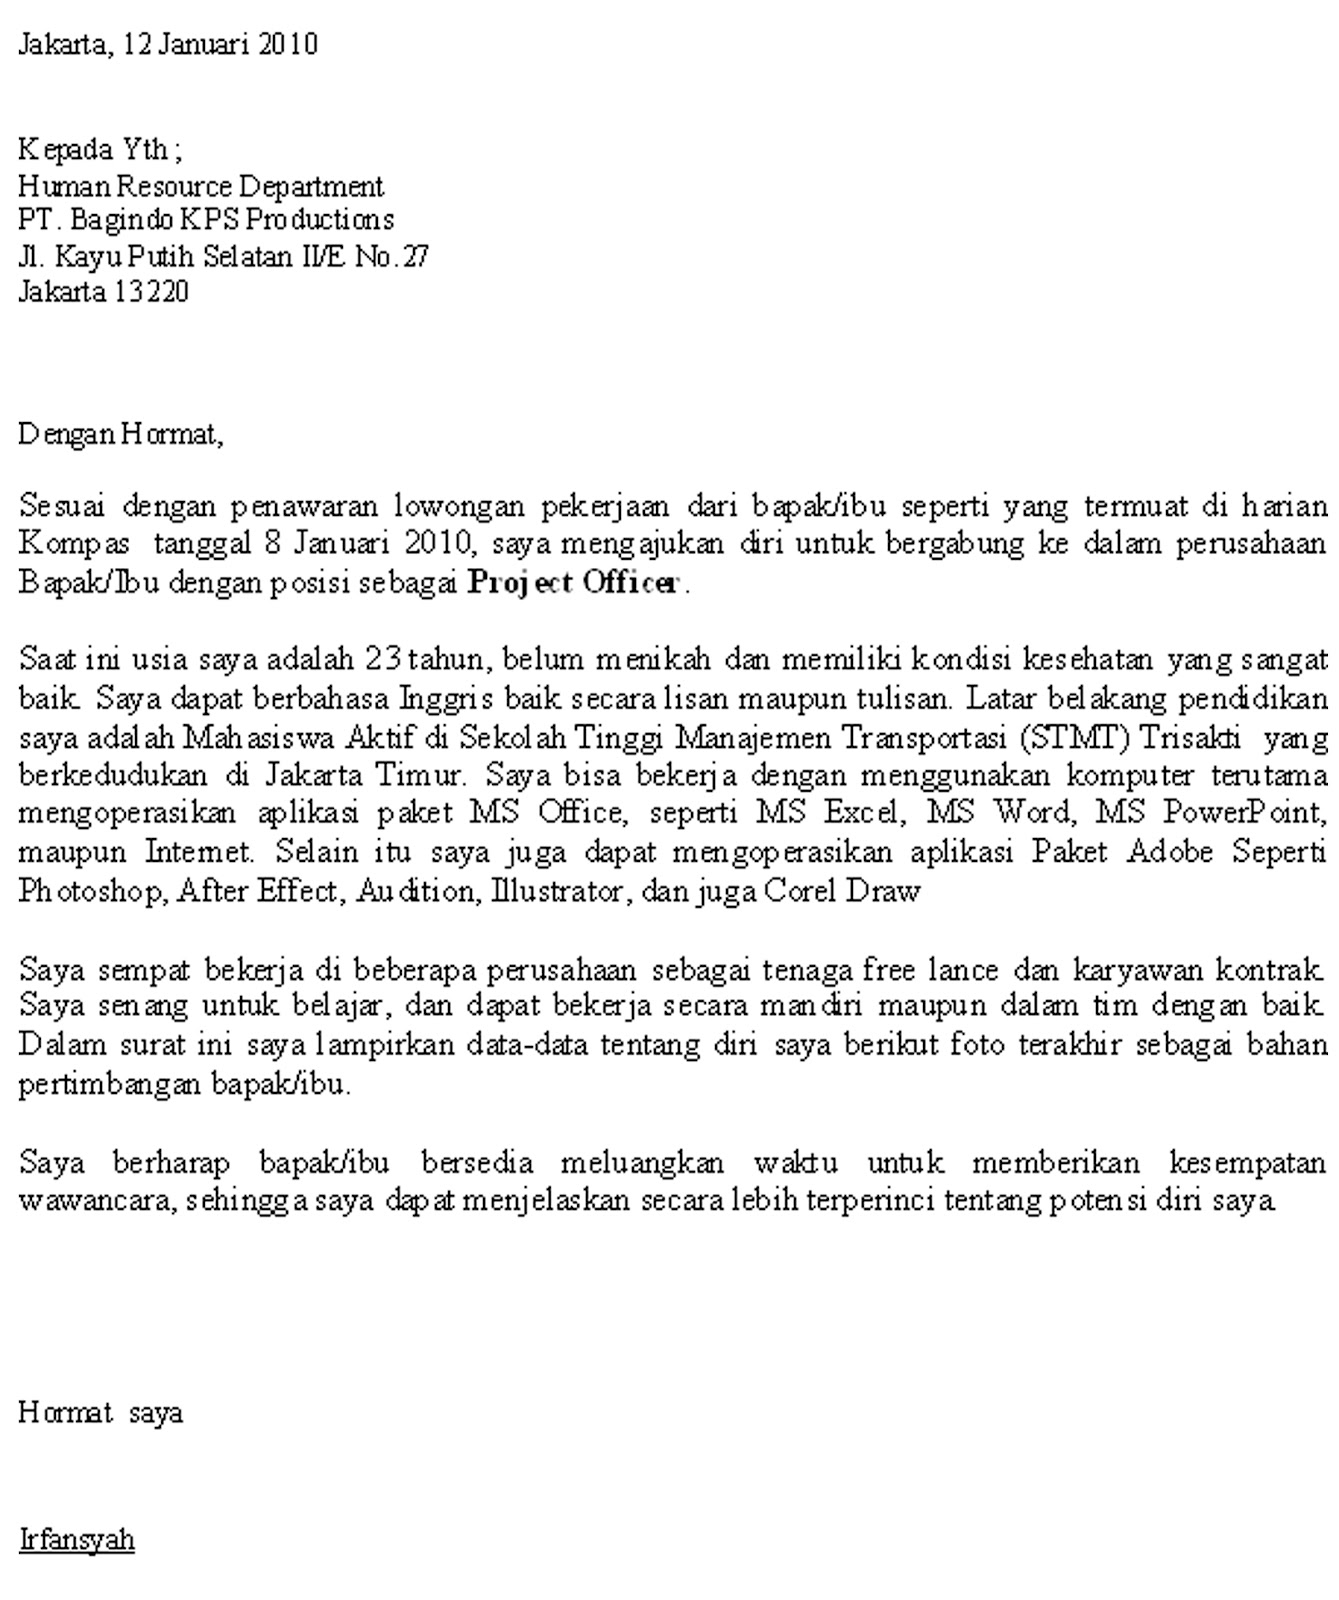 Lowongan Kerja Karawang Januari 2013 Terbaru Lowongan Kerja Perum Peruri Karawang Oktober 2016 Terbaru Contoh Surat Lamaran Kerja Bahasa Inggris